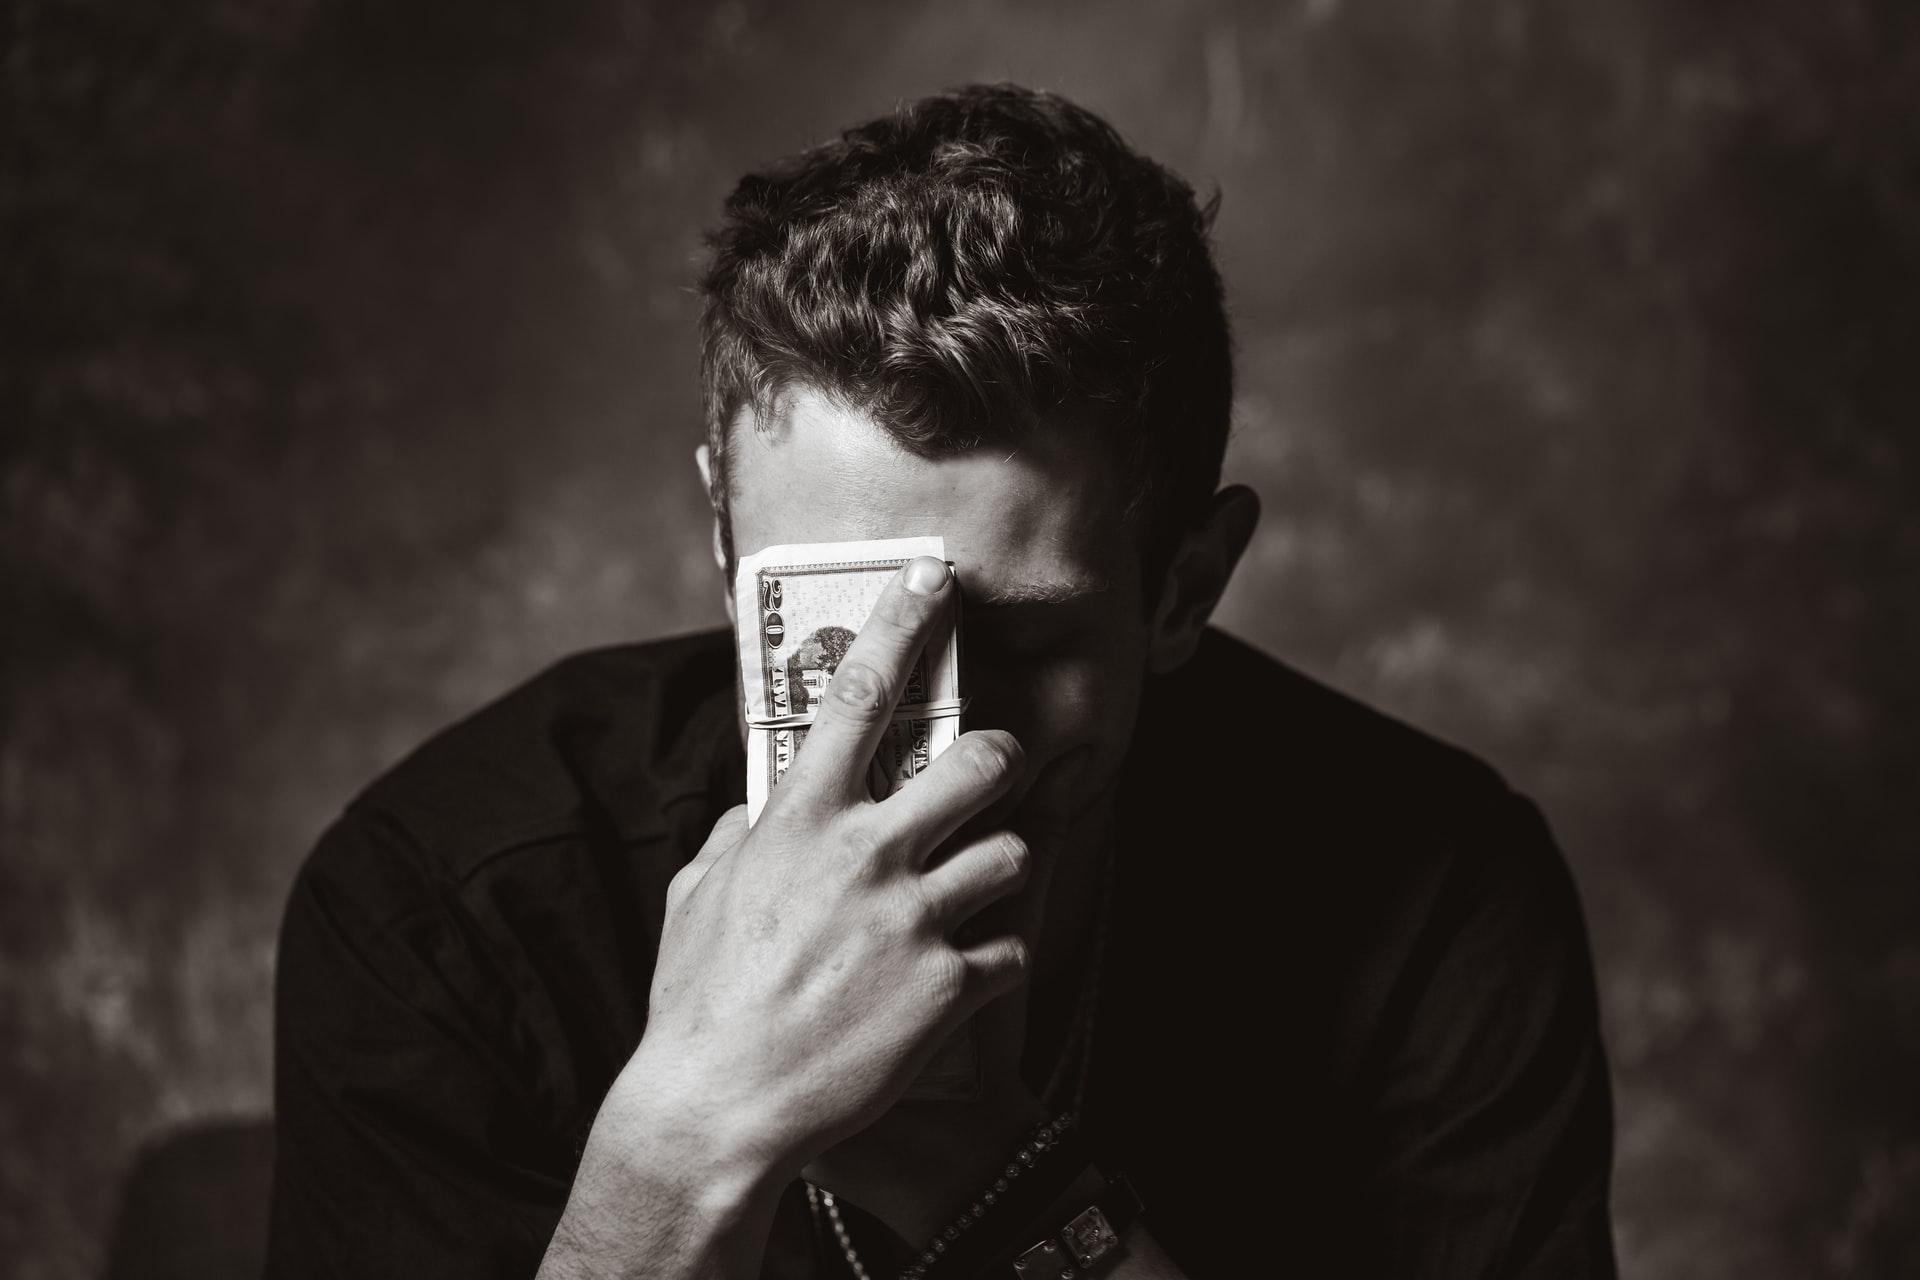 kredyt we frankach, kryzys